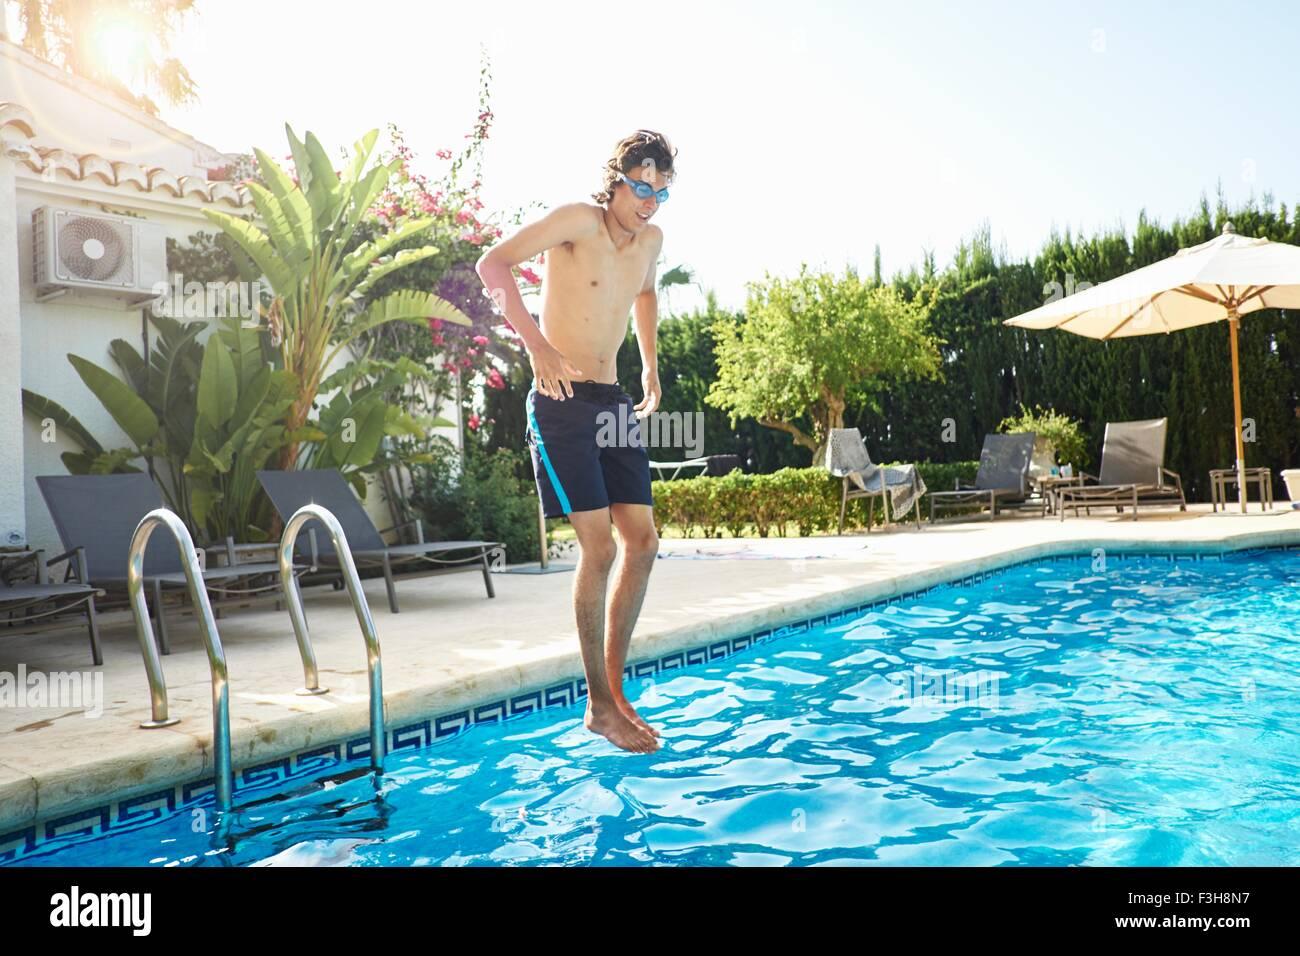 Jeune homme portant des lunettes de natation jumping into swimming pool Photo Stock